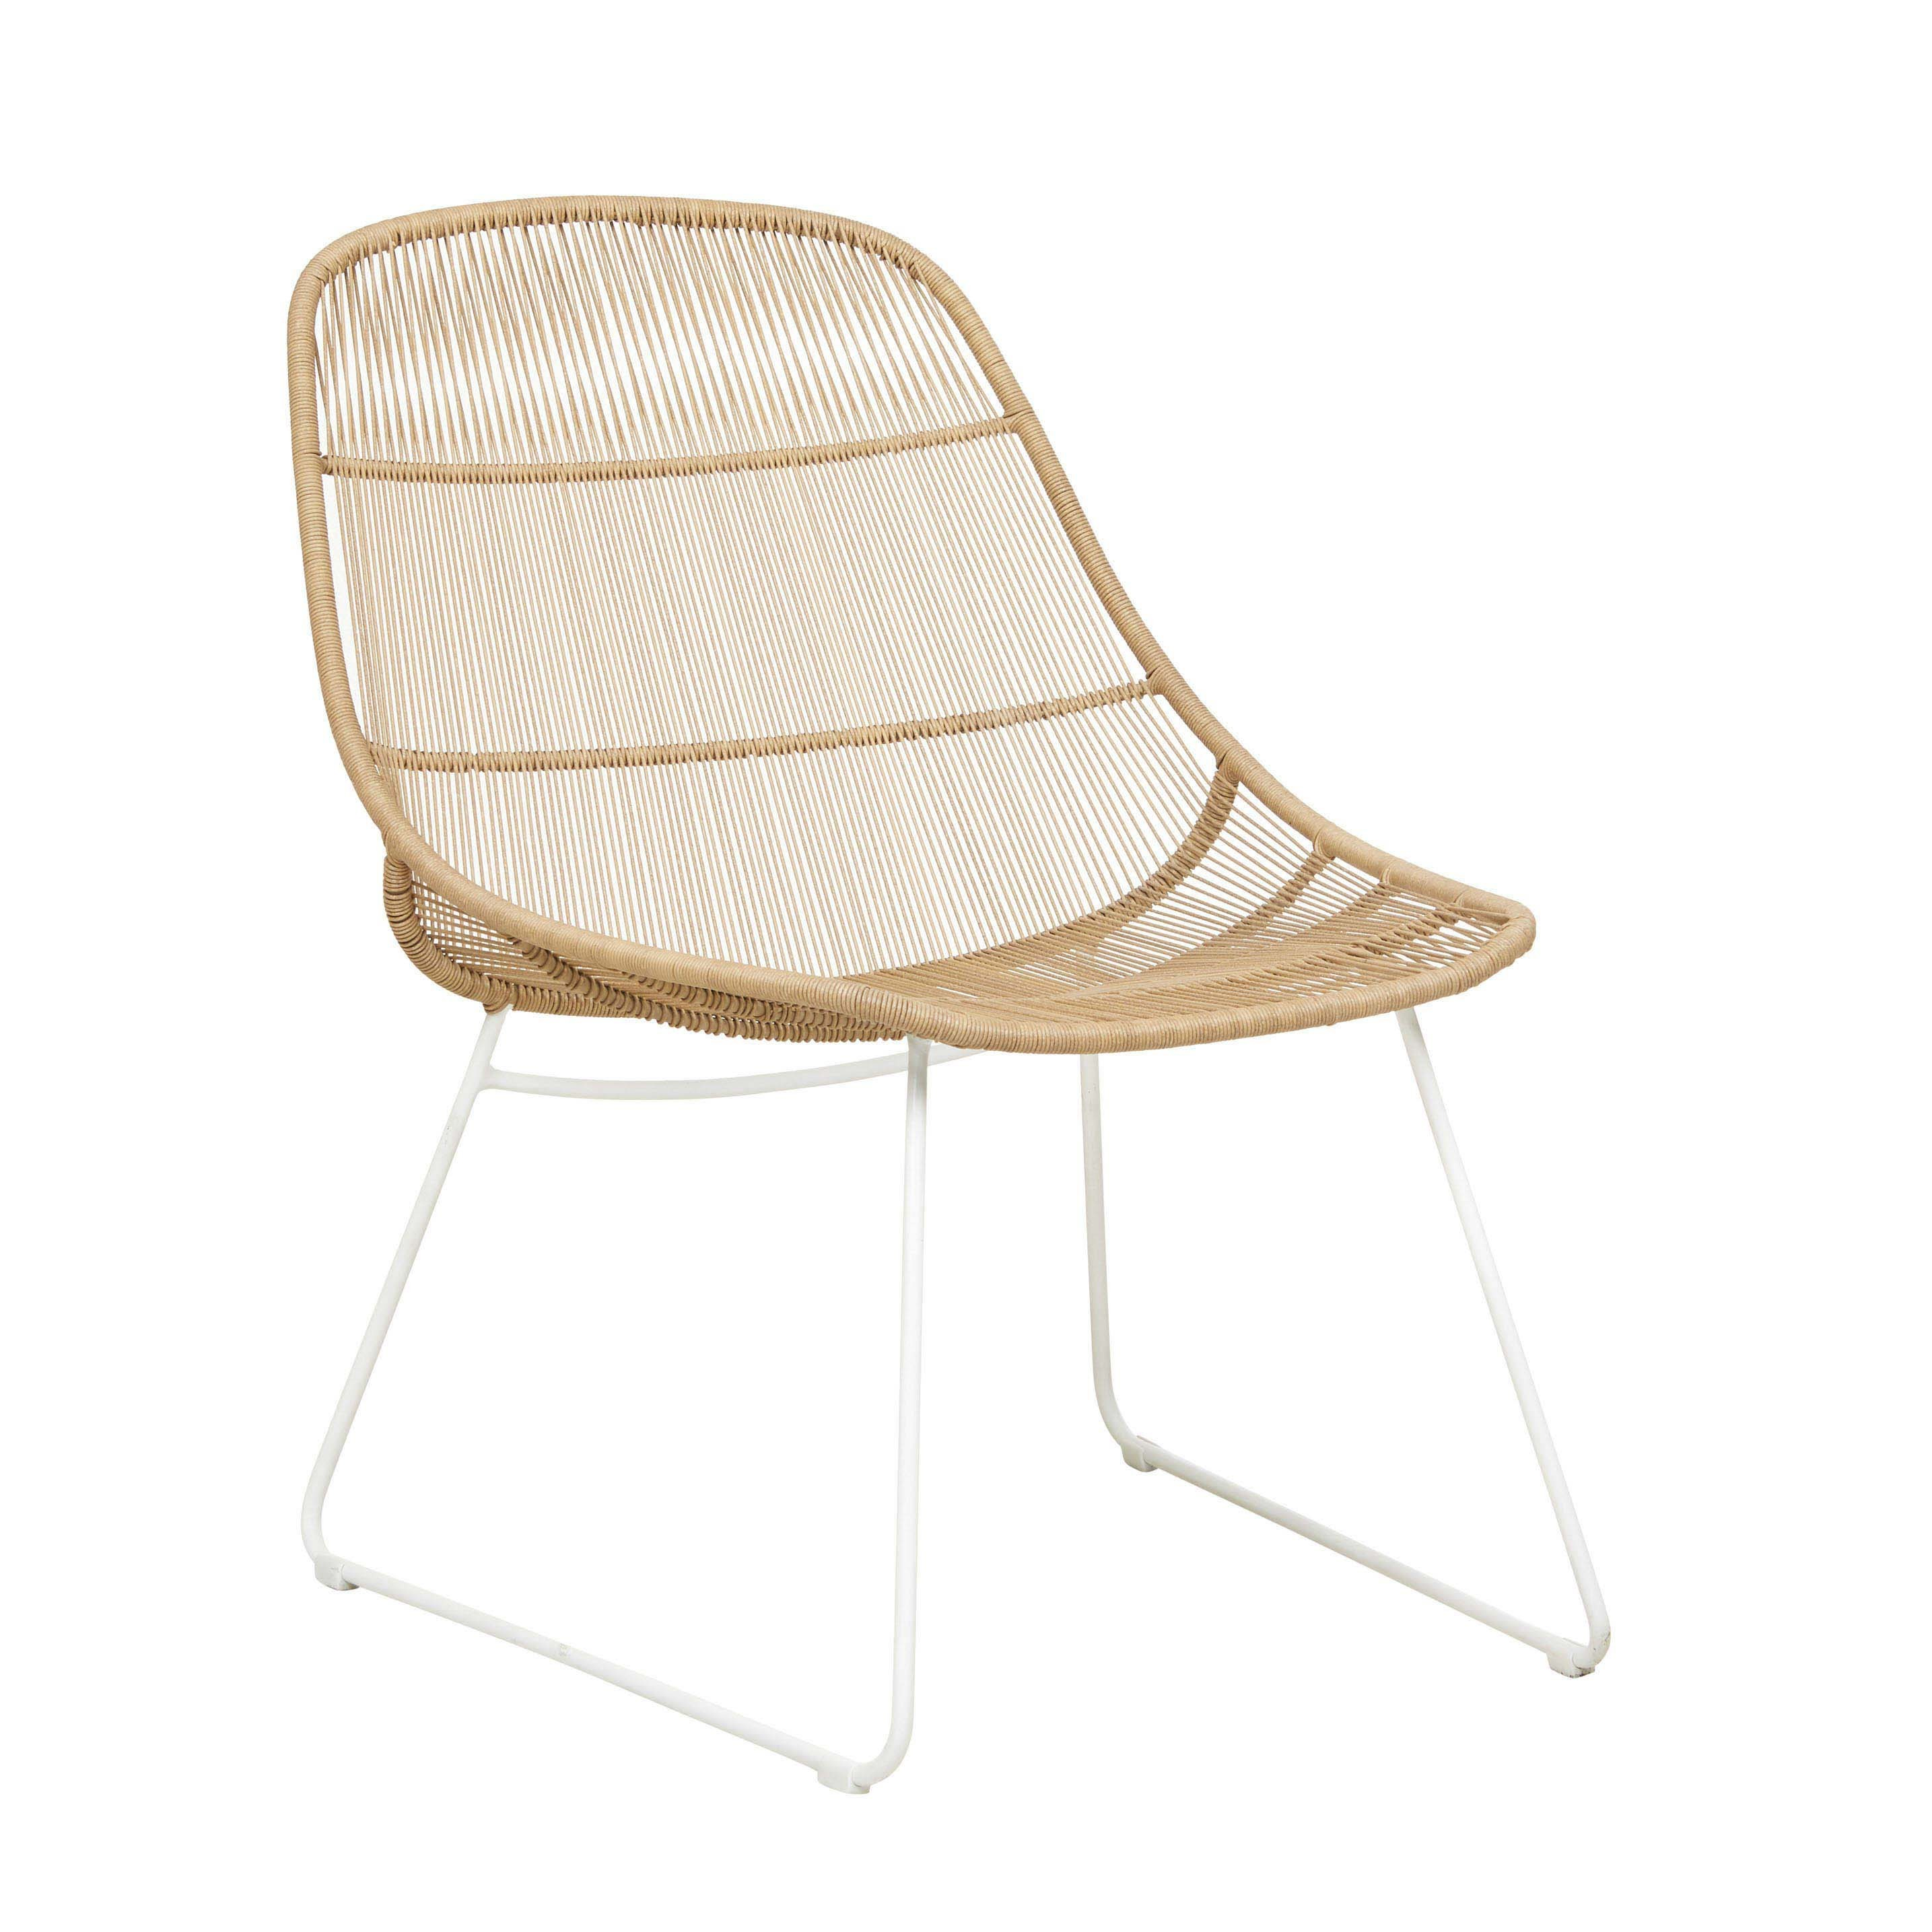 Furniture Hero-Images Occasional-Chairs granada-scoop-01